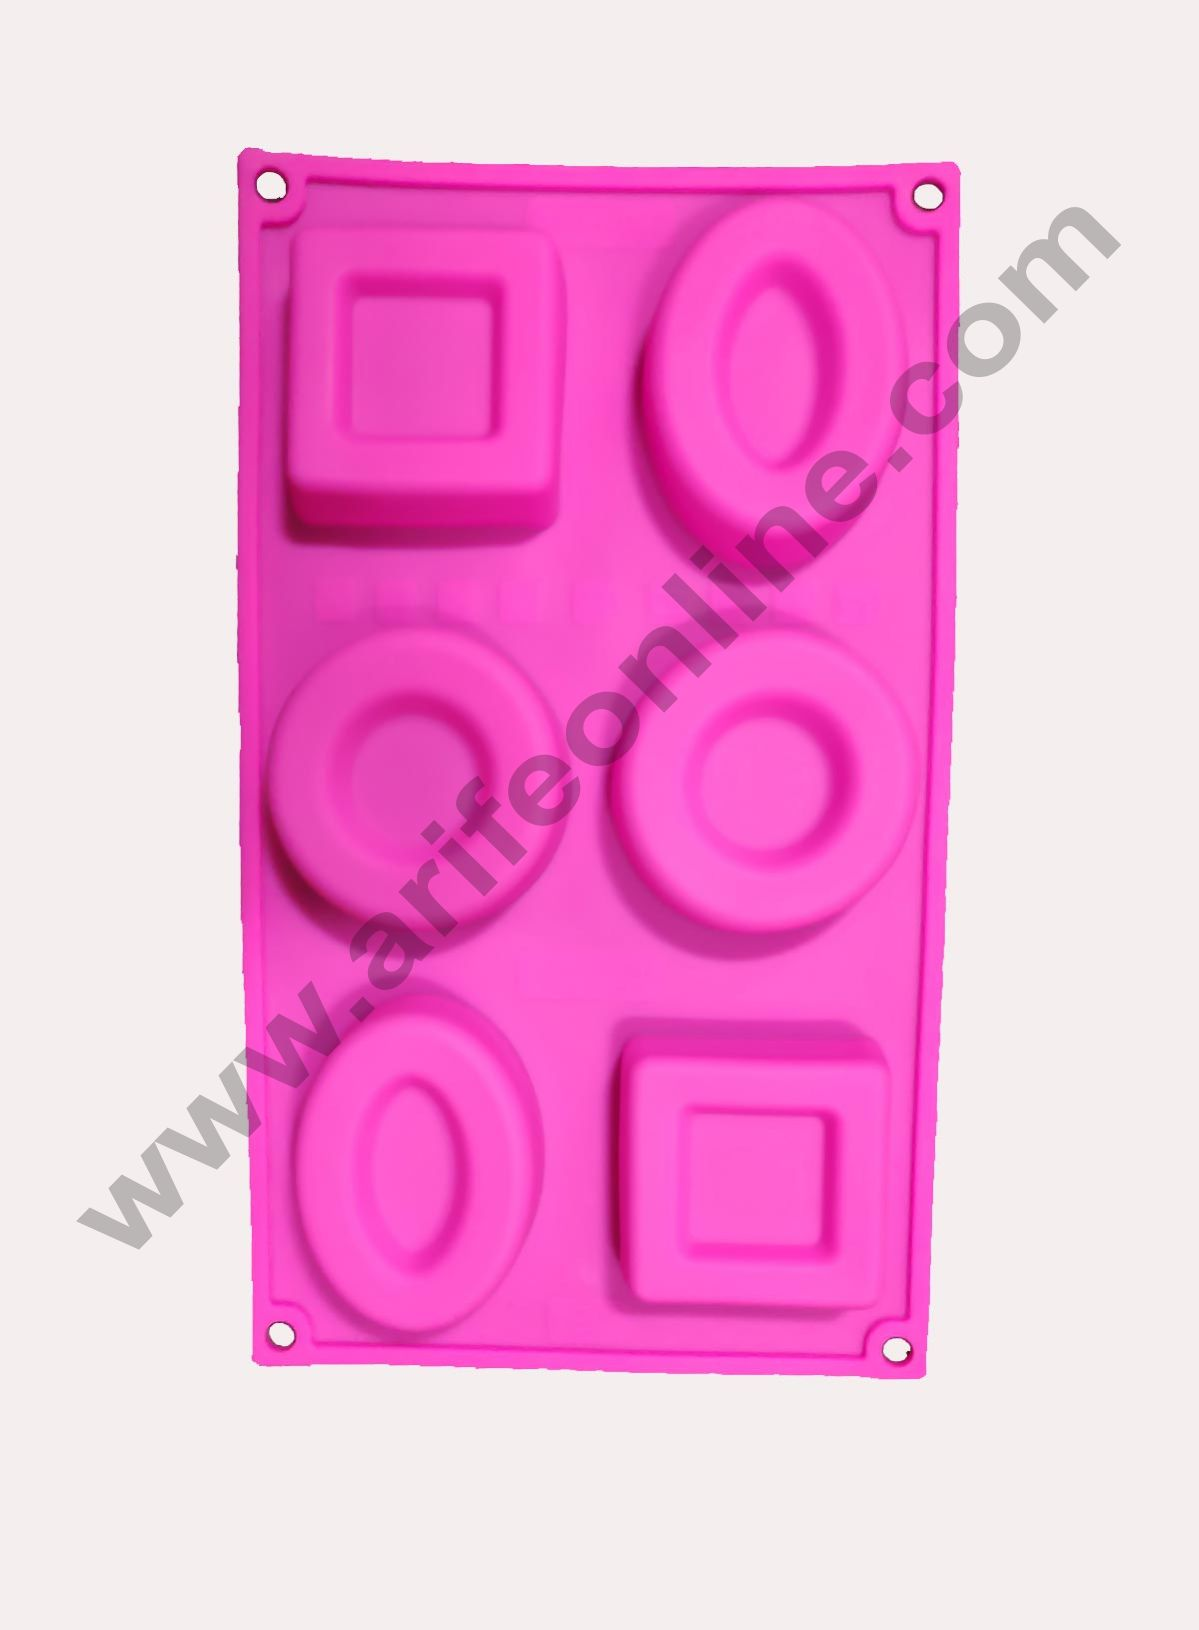 Cake Decor Silicon 6 Cavity,Square,Circle and Oval Non Sticky Mold for soap,Chocolate, Fondant Sugar bakeware Mold